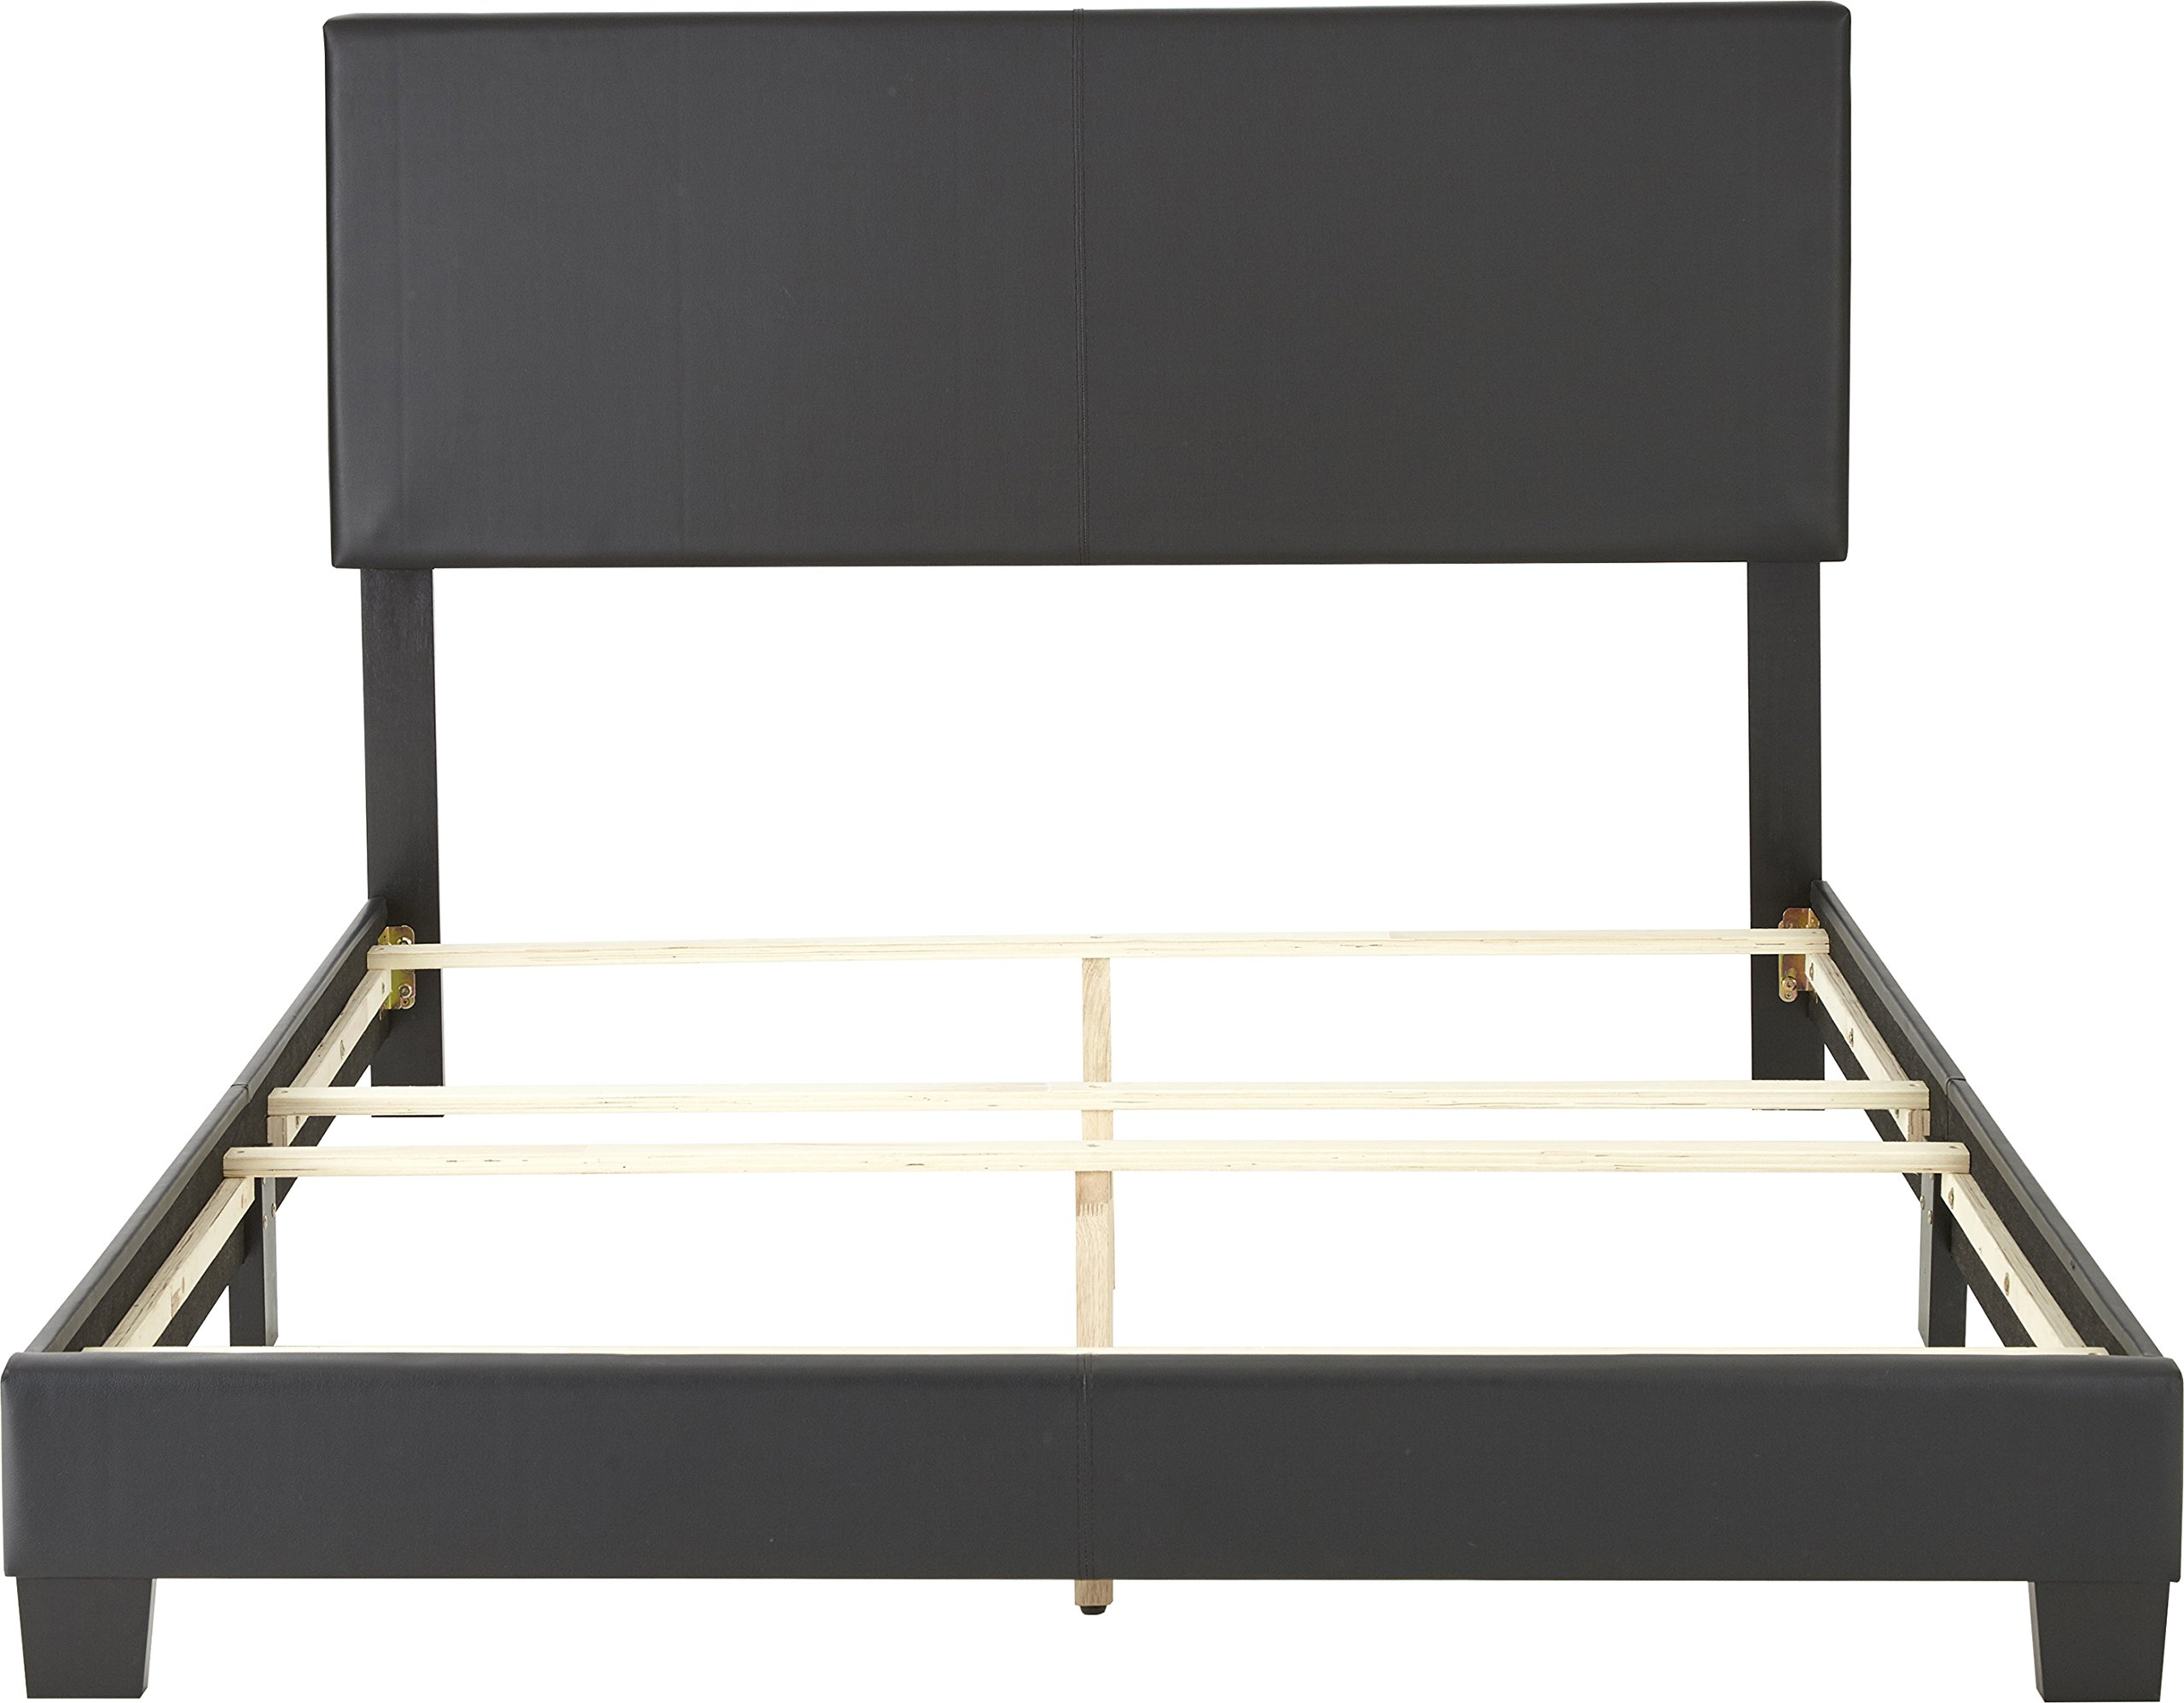 Flex Form Montana Upholstered Platform Bed Frame with Headboard: Faux Leather, Black, Full by Flex Form (Image #6)